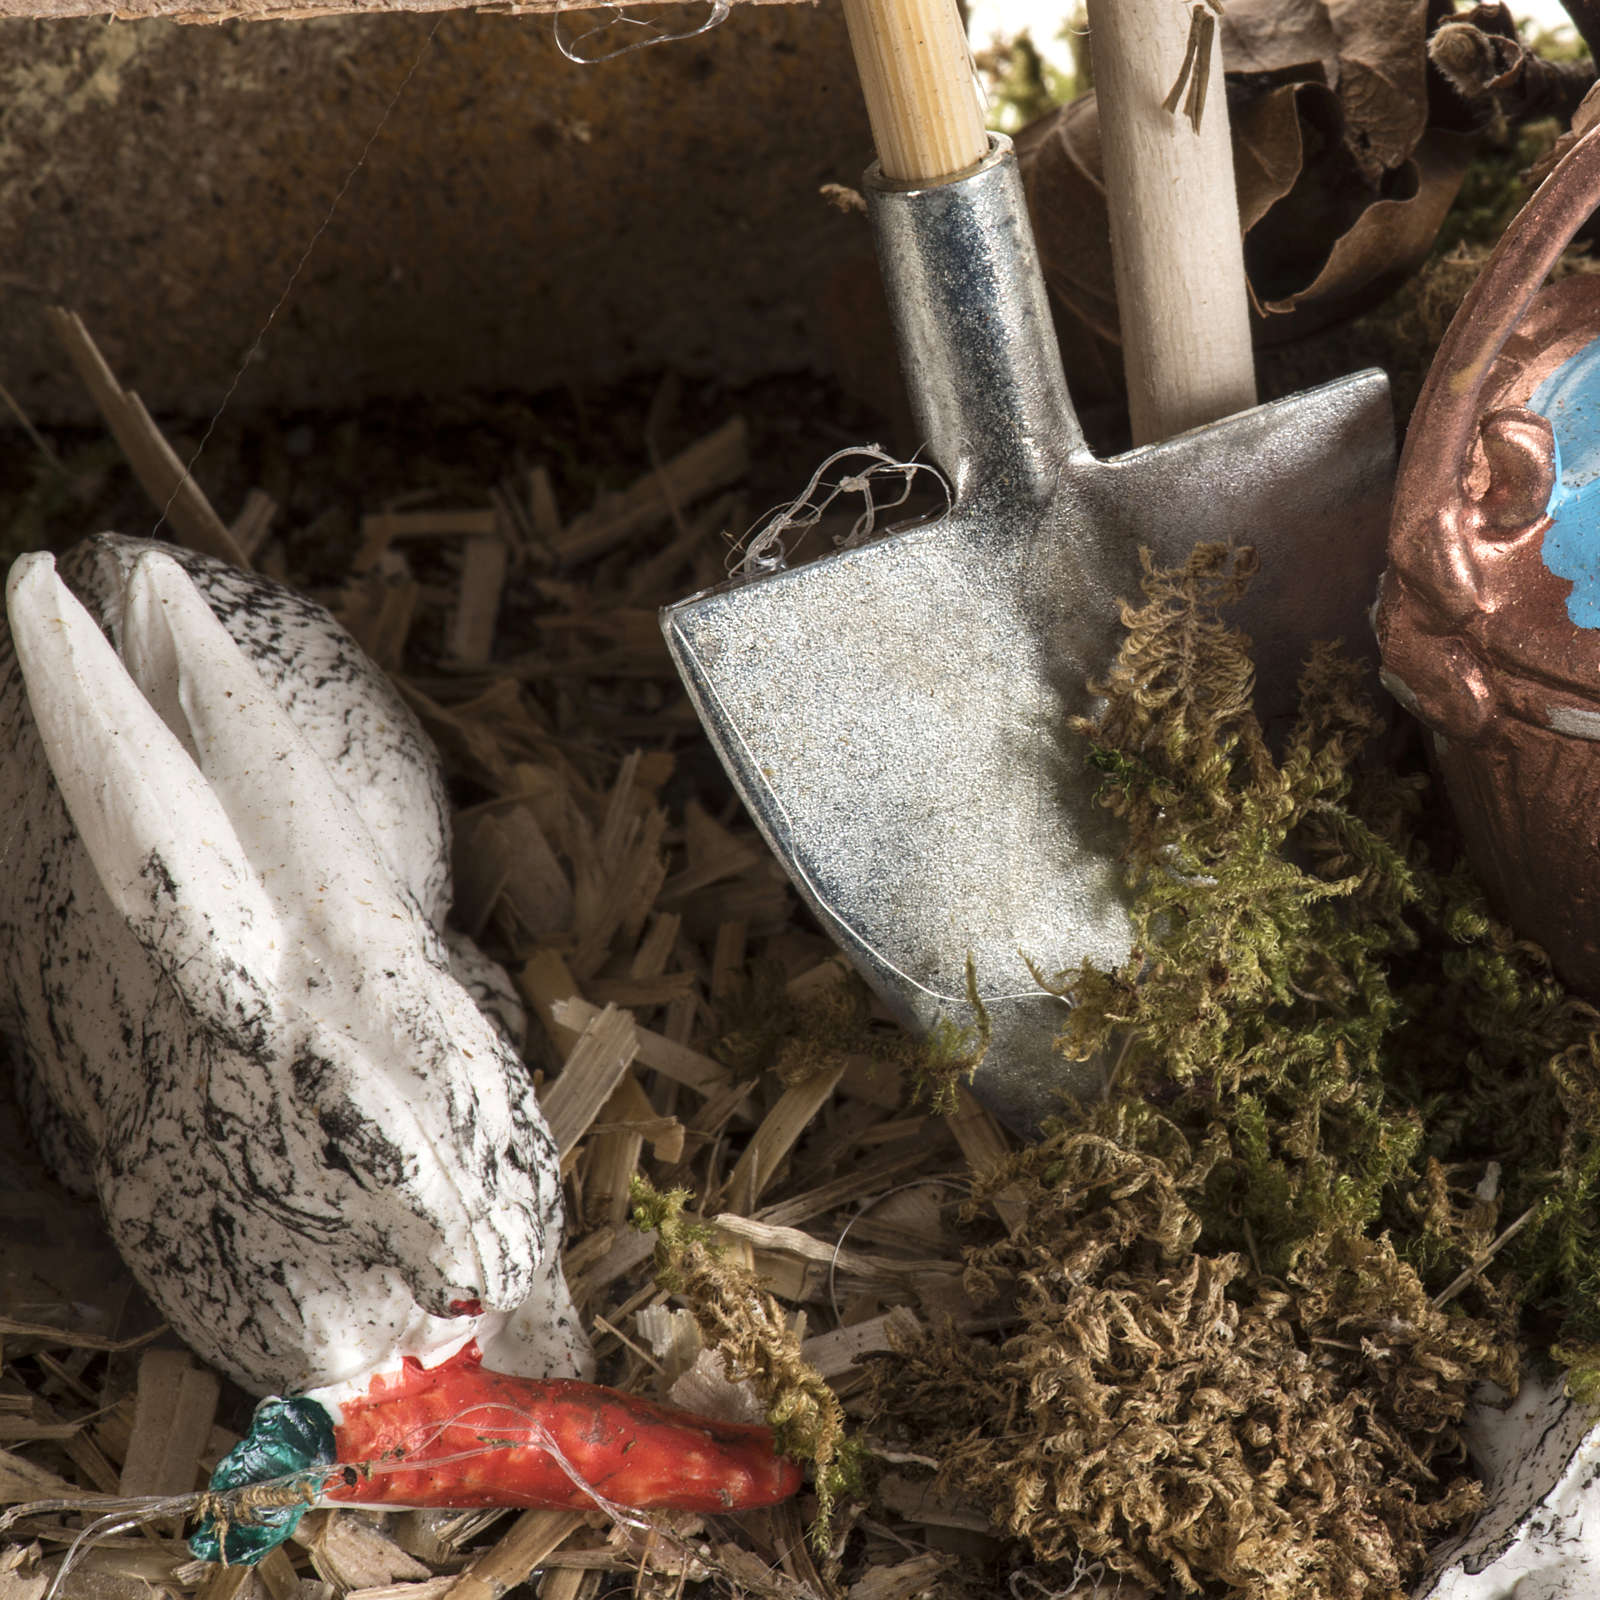 Conigli in ambientazione presepe 8-10 cm 3